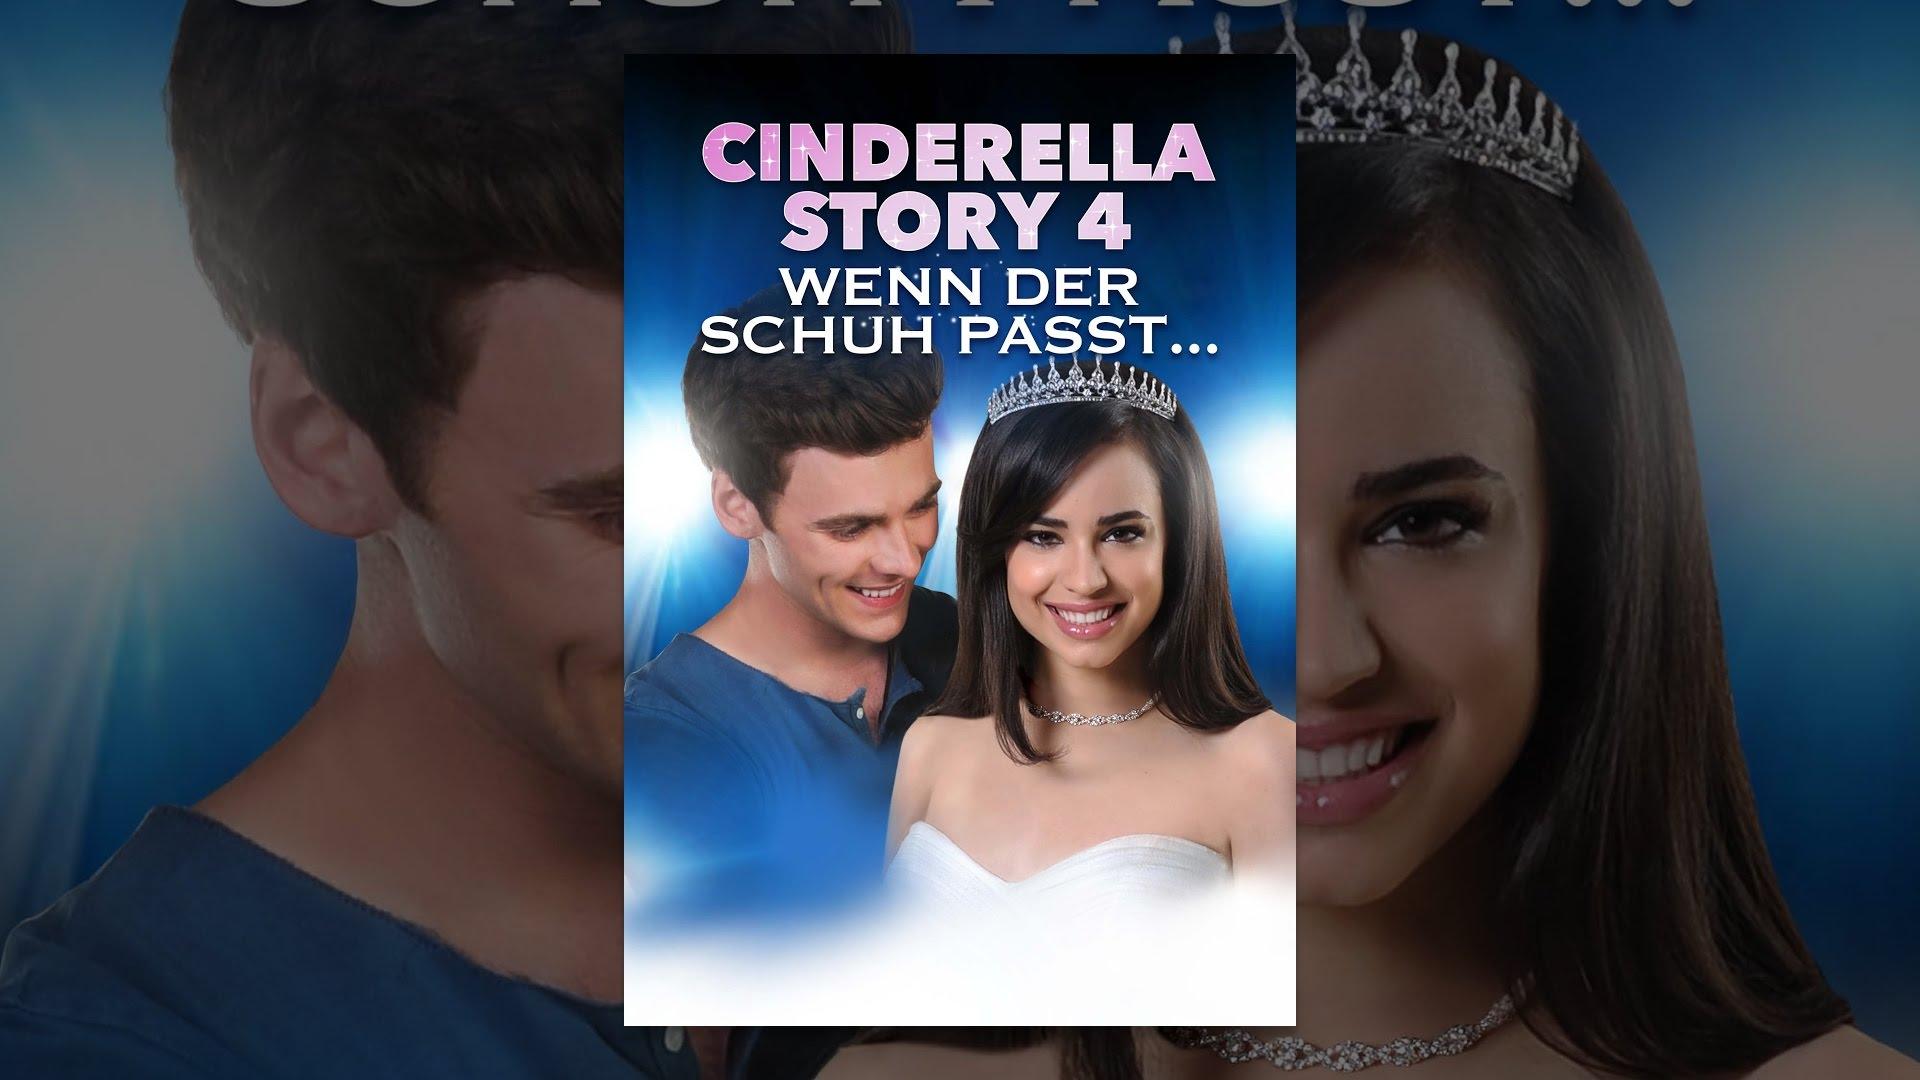 cinderella story 4 streamcloud